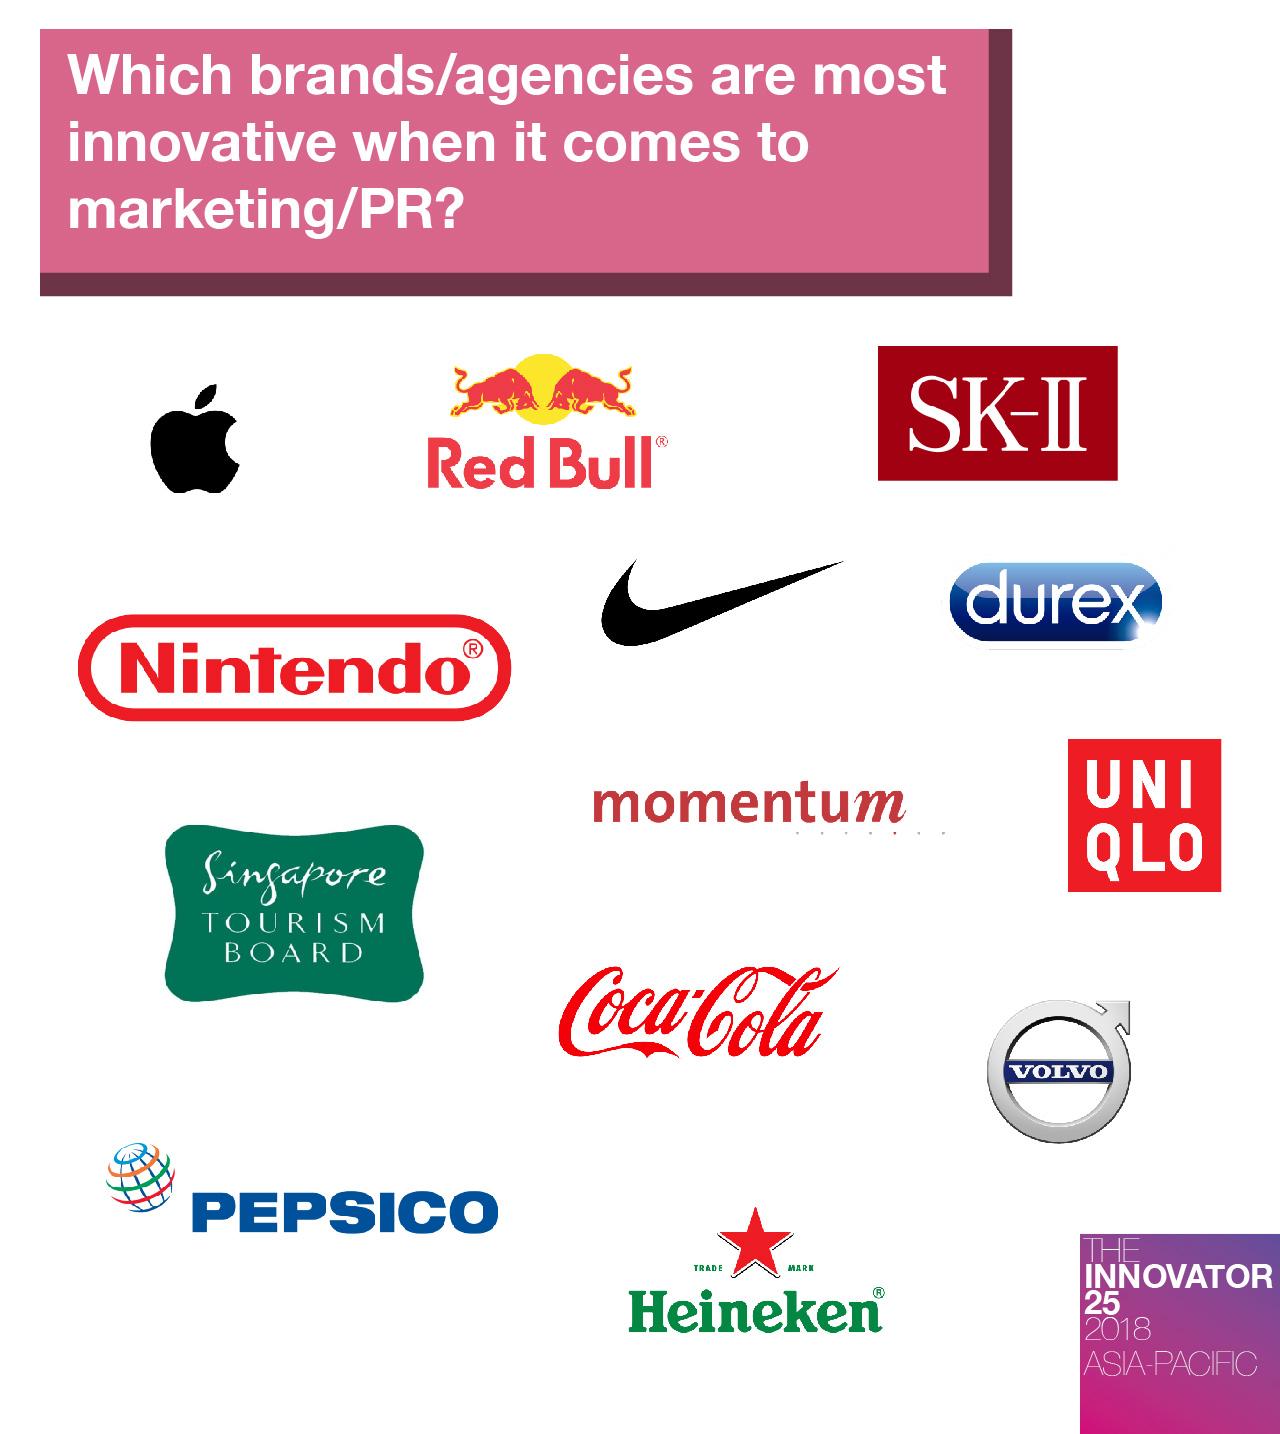 innovator-25-ap-brands